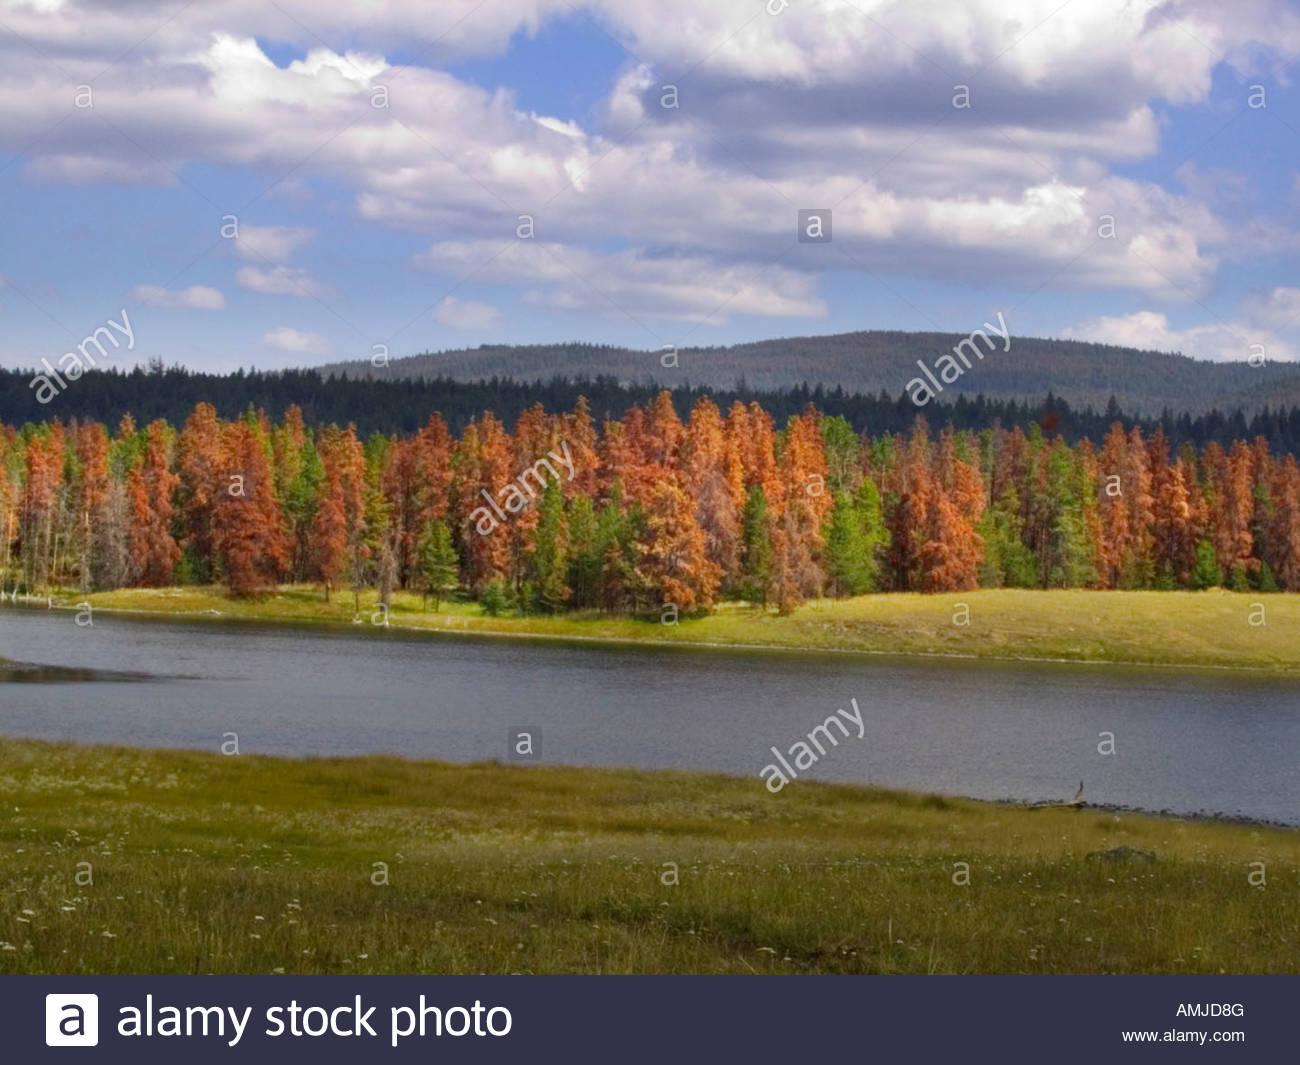 Pine trees killed by Mountain Pine Beetle Dendroctonus ponderosae - Stock Image